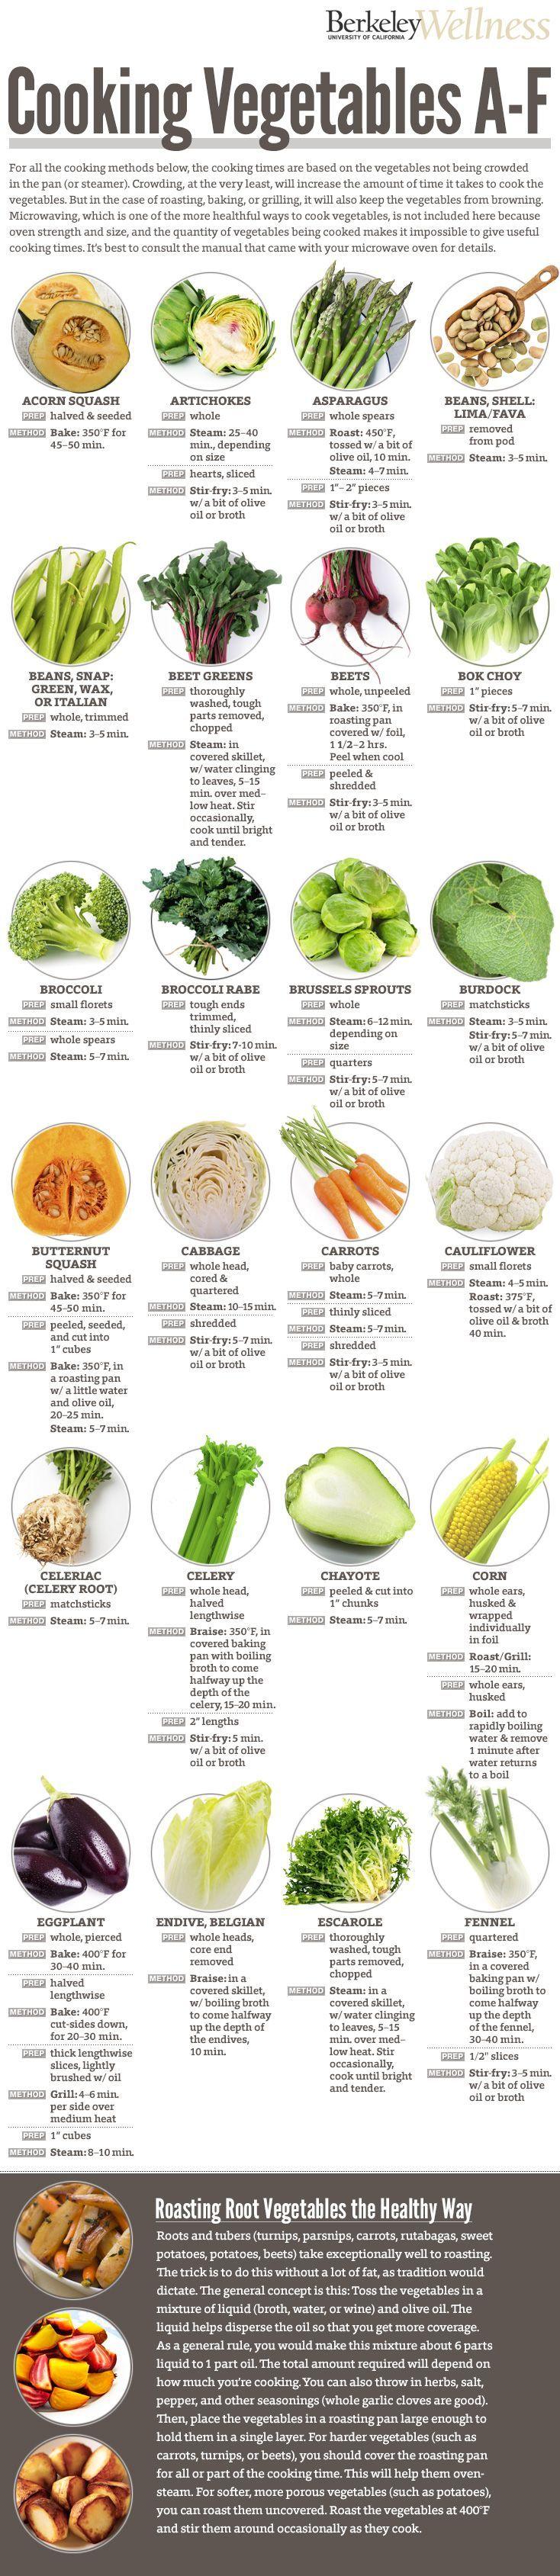 60+ Healthy Ways to Cook Vegetables